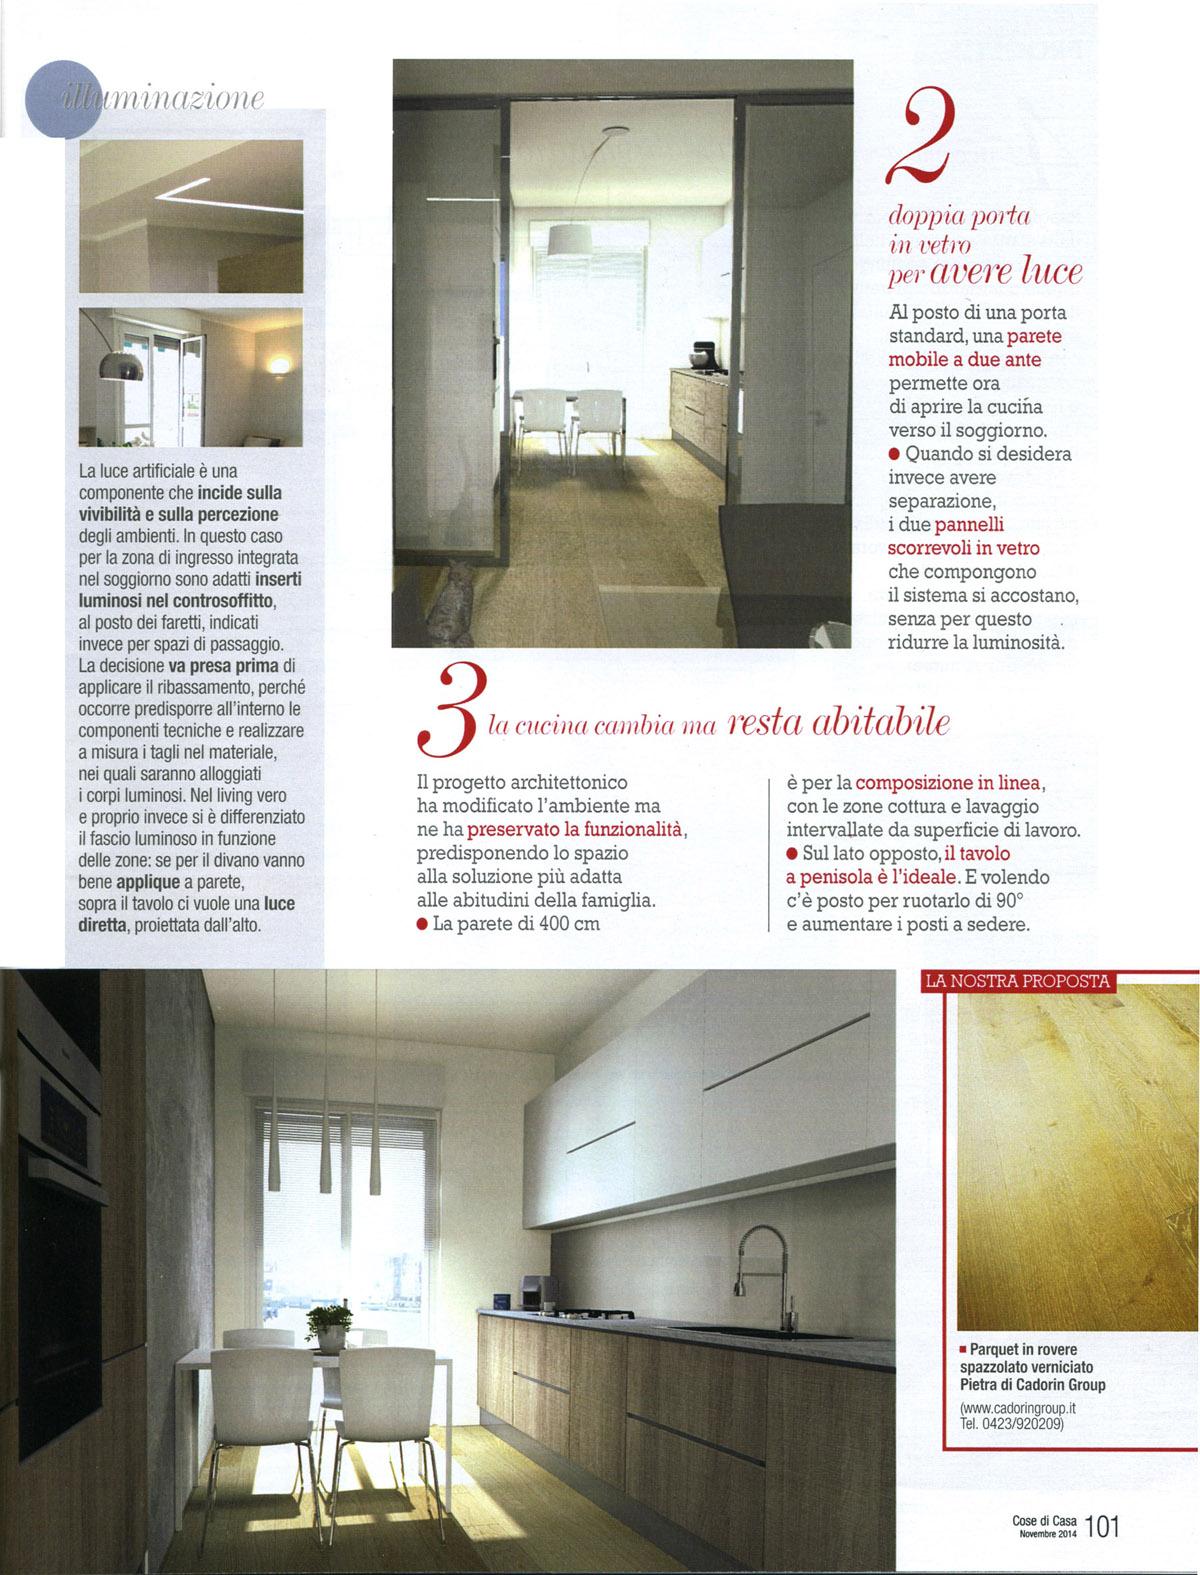 Ante Cucina In Vetro.Wooden Parquet Flooring Decoration Design Magazines Nov 2014 Cadorin